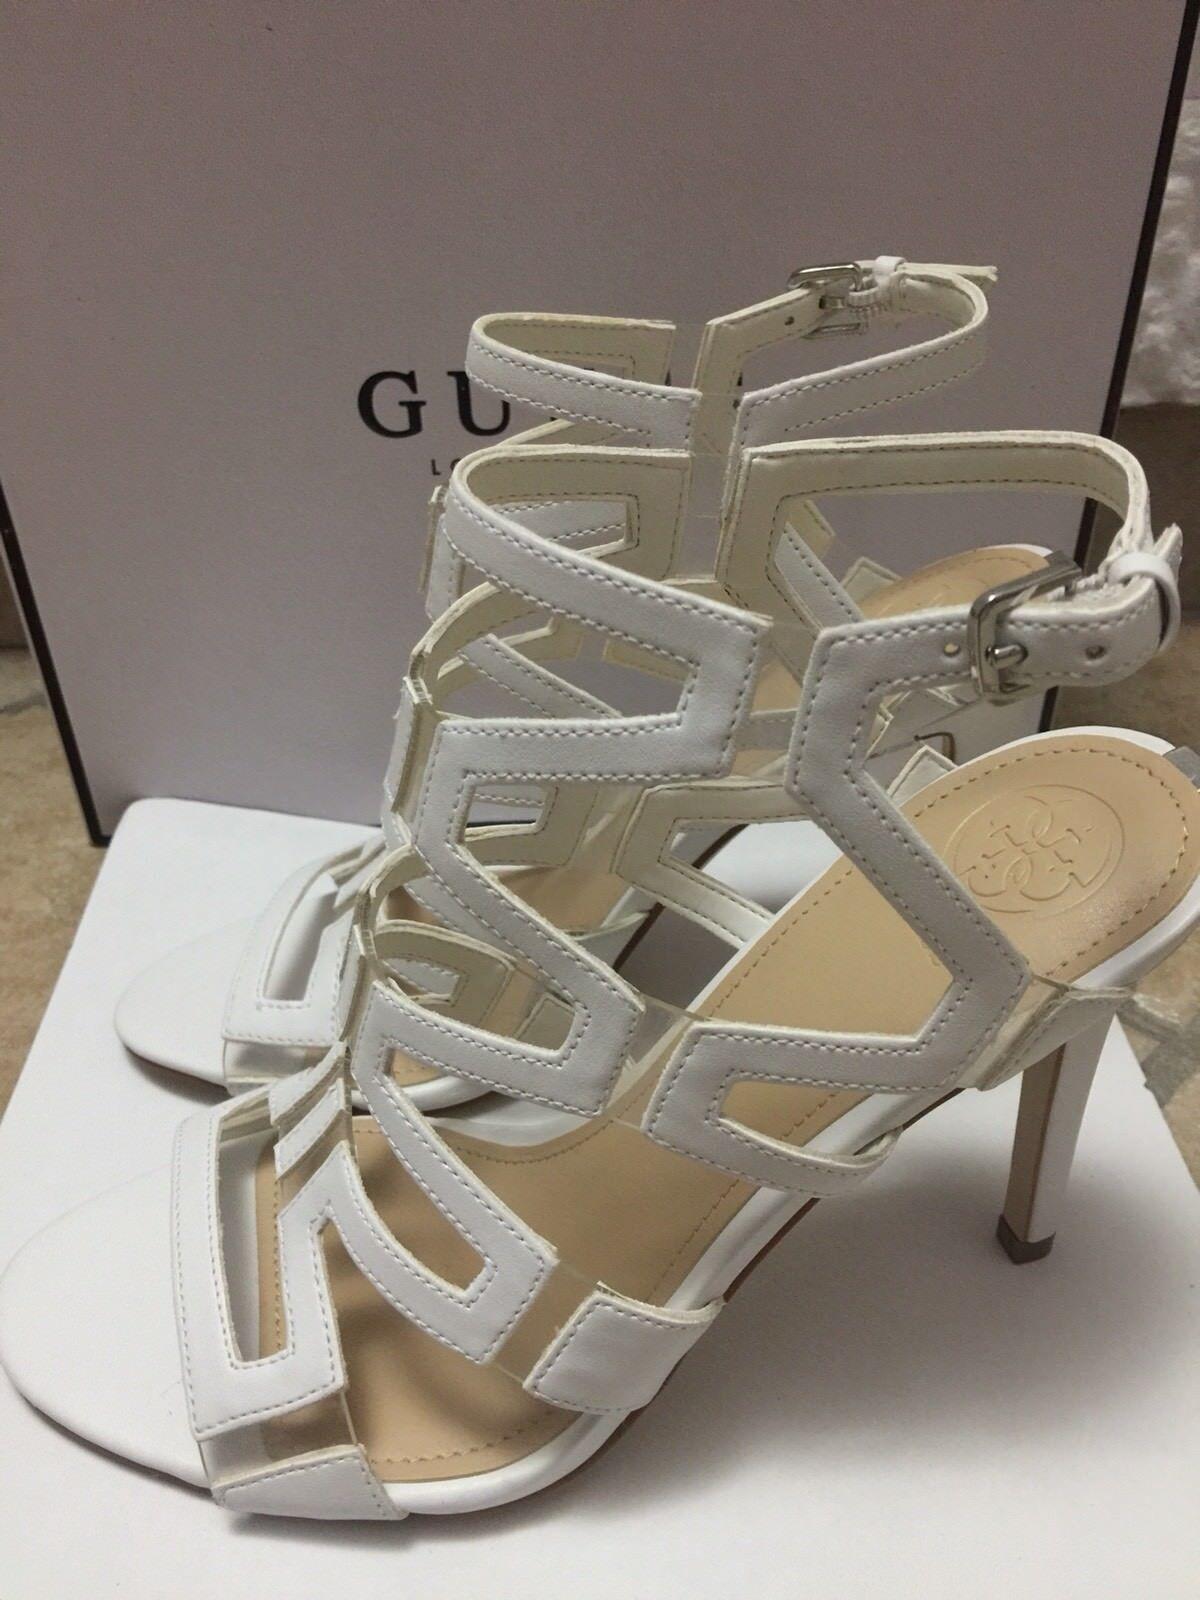 Guess Scarpe 7 Sandali Donna Mod.PADTON 3 Bianco/White Tg.38,5 US 7 Scarpe 1/2 UK 5,5 7c4eb4